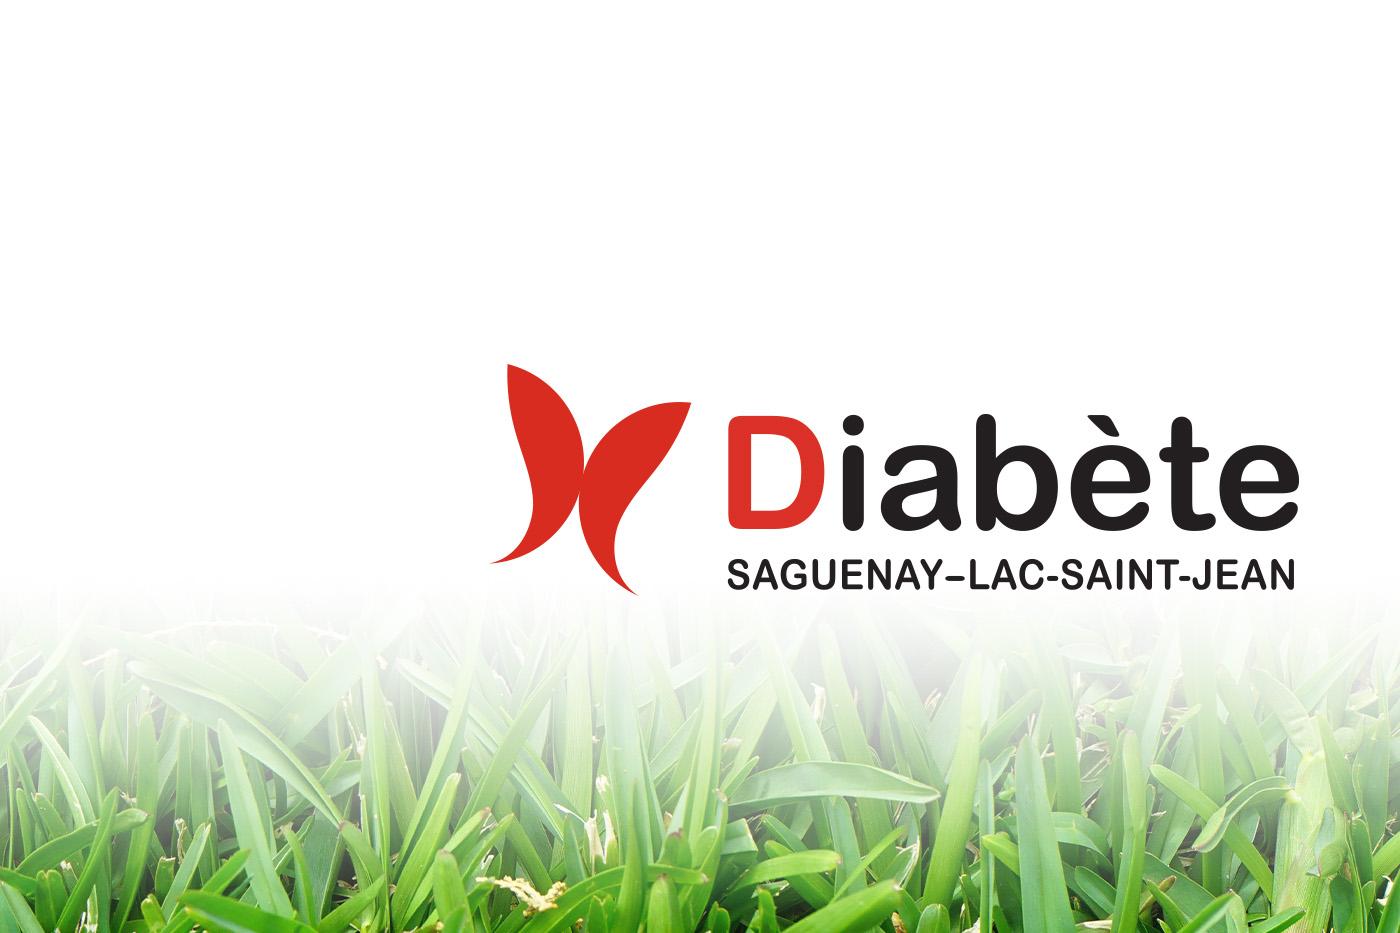 image-DiabeteSLSJ